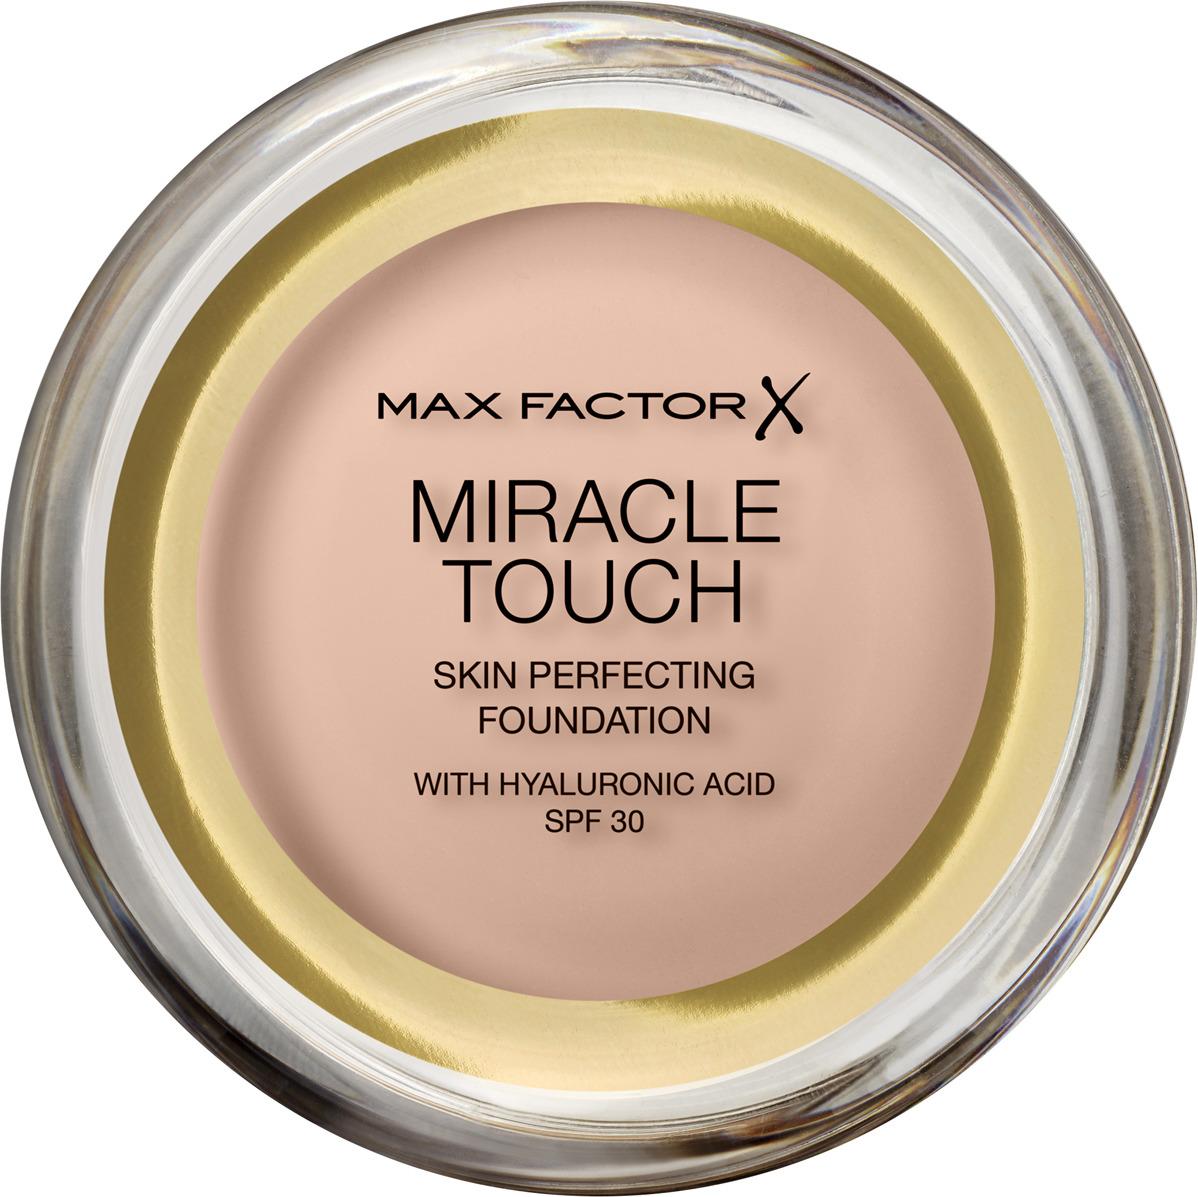 Тональная основа Max Factor Miracle Touch, SPF 30, тон 35 Pearl Beige, 11 мл max factor тональная основа miracle match тон bronze 80